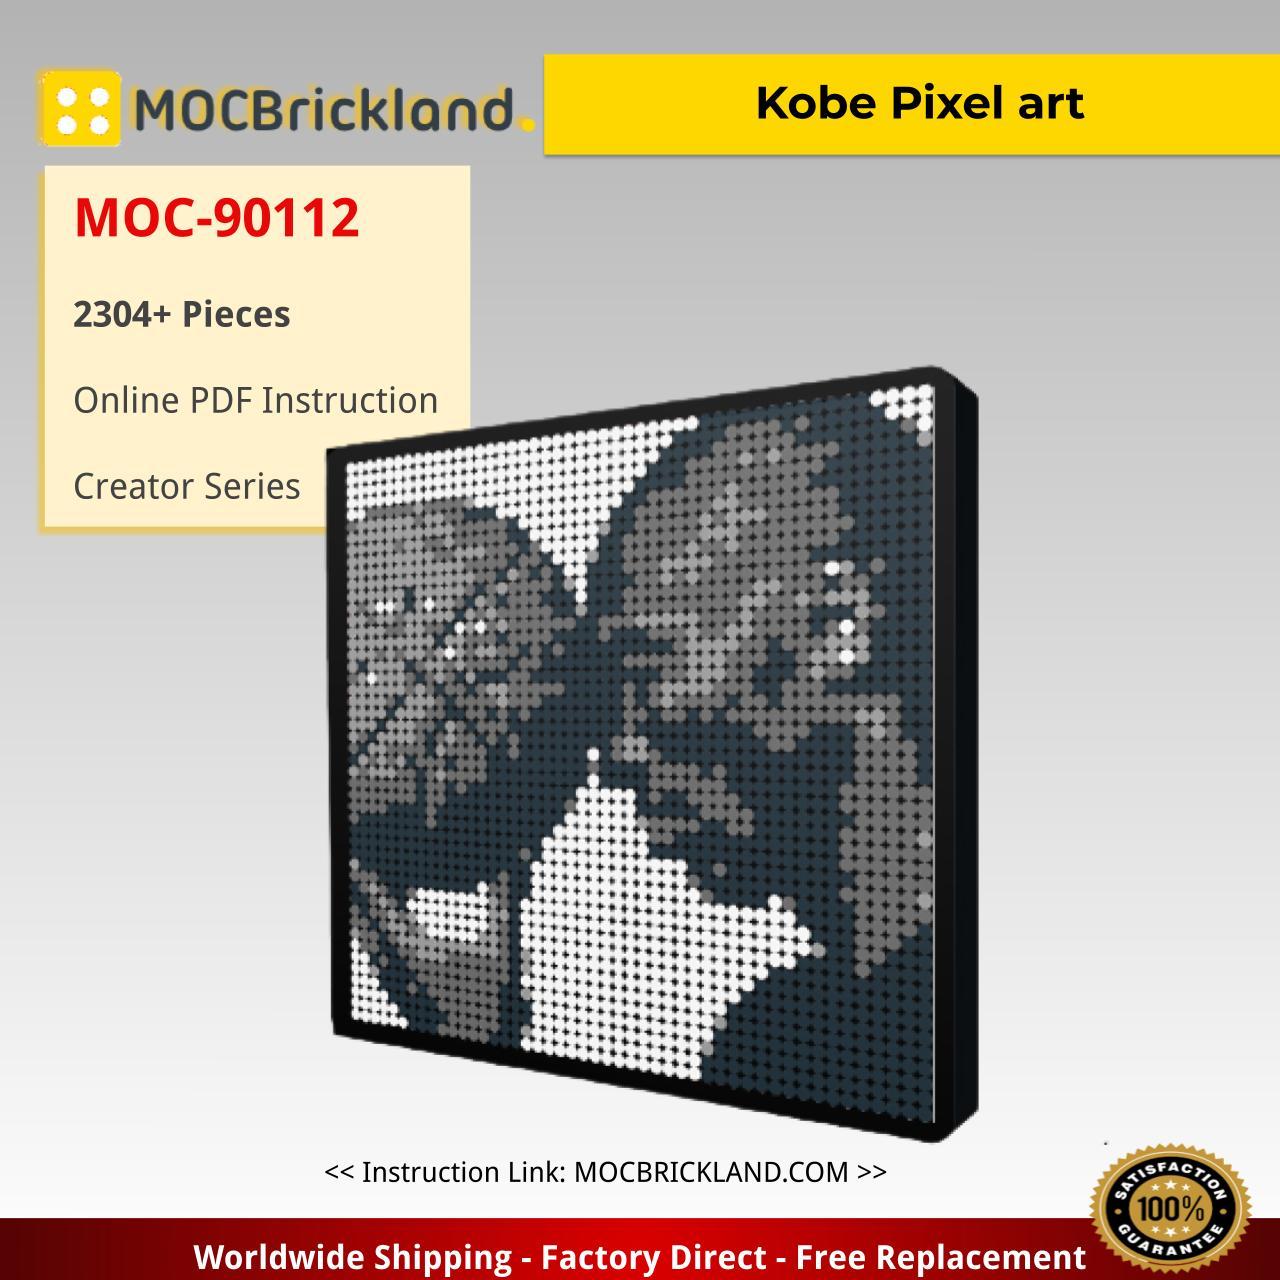 Kobe Pixel art MOC-90112 Creator With 2304 Pieces